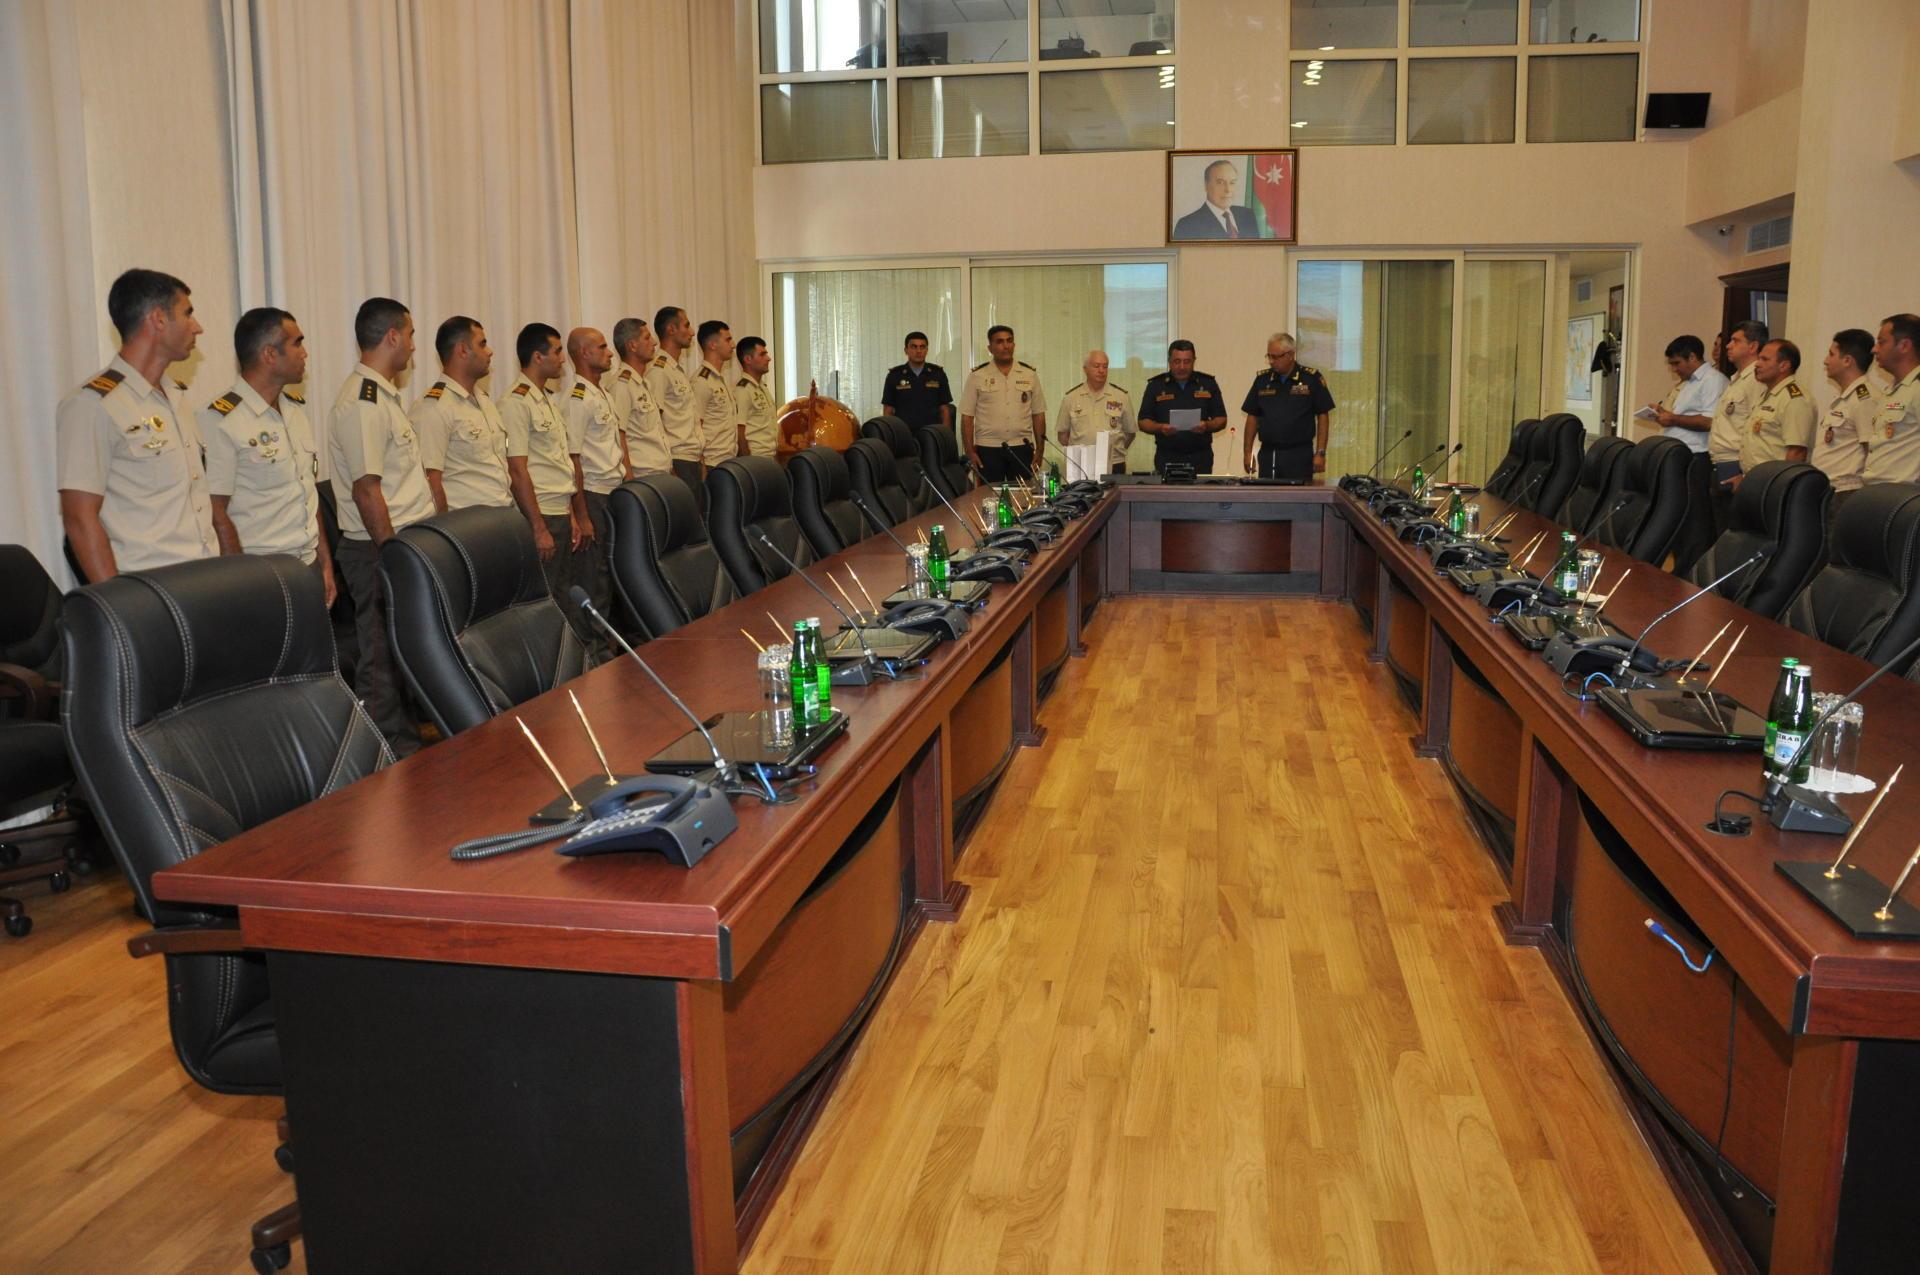 Министерство обороны Азербайджана наградило сотрудников МЧС (ФОТО)